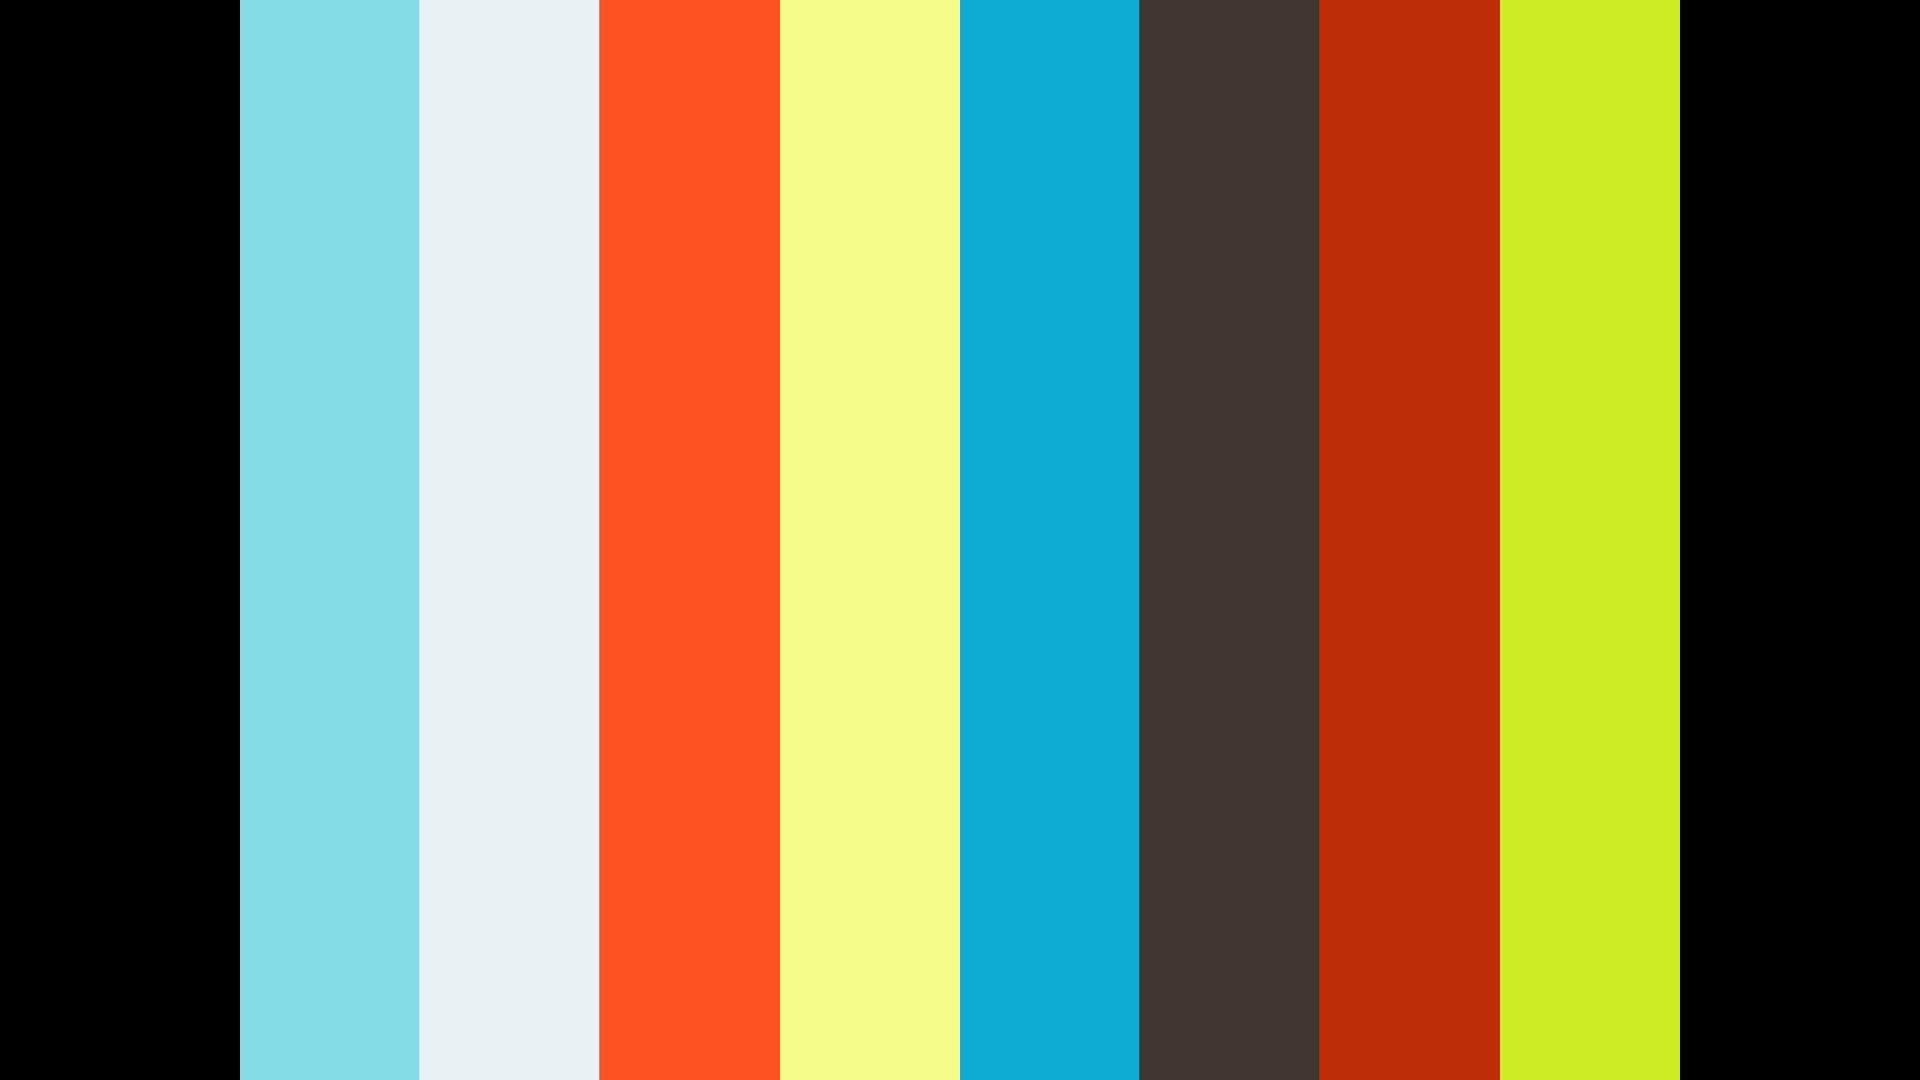 JASI-2018-PRELIM-Purvis MS Velocity